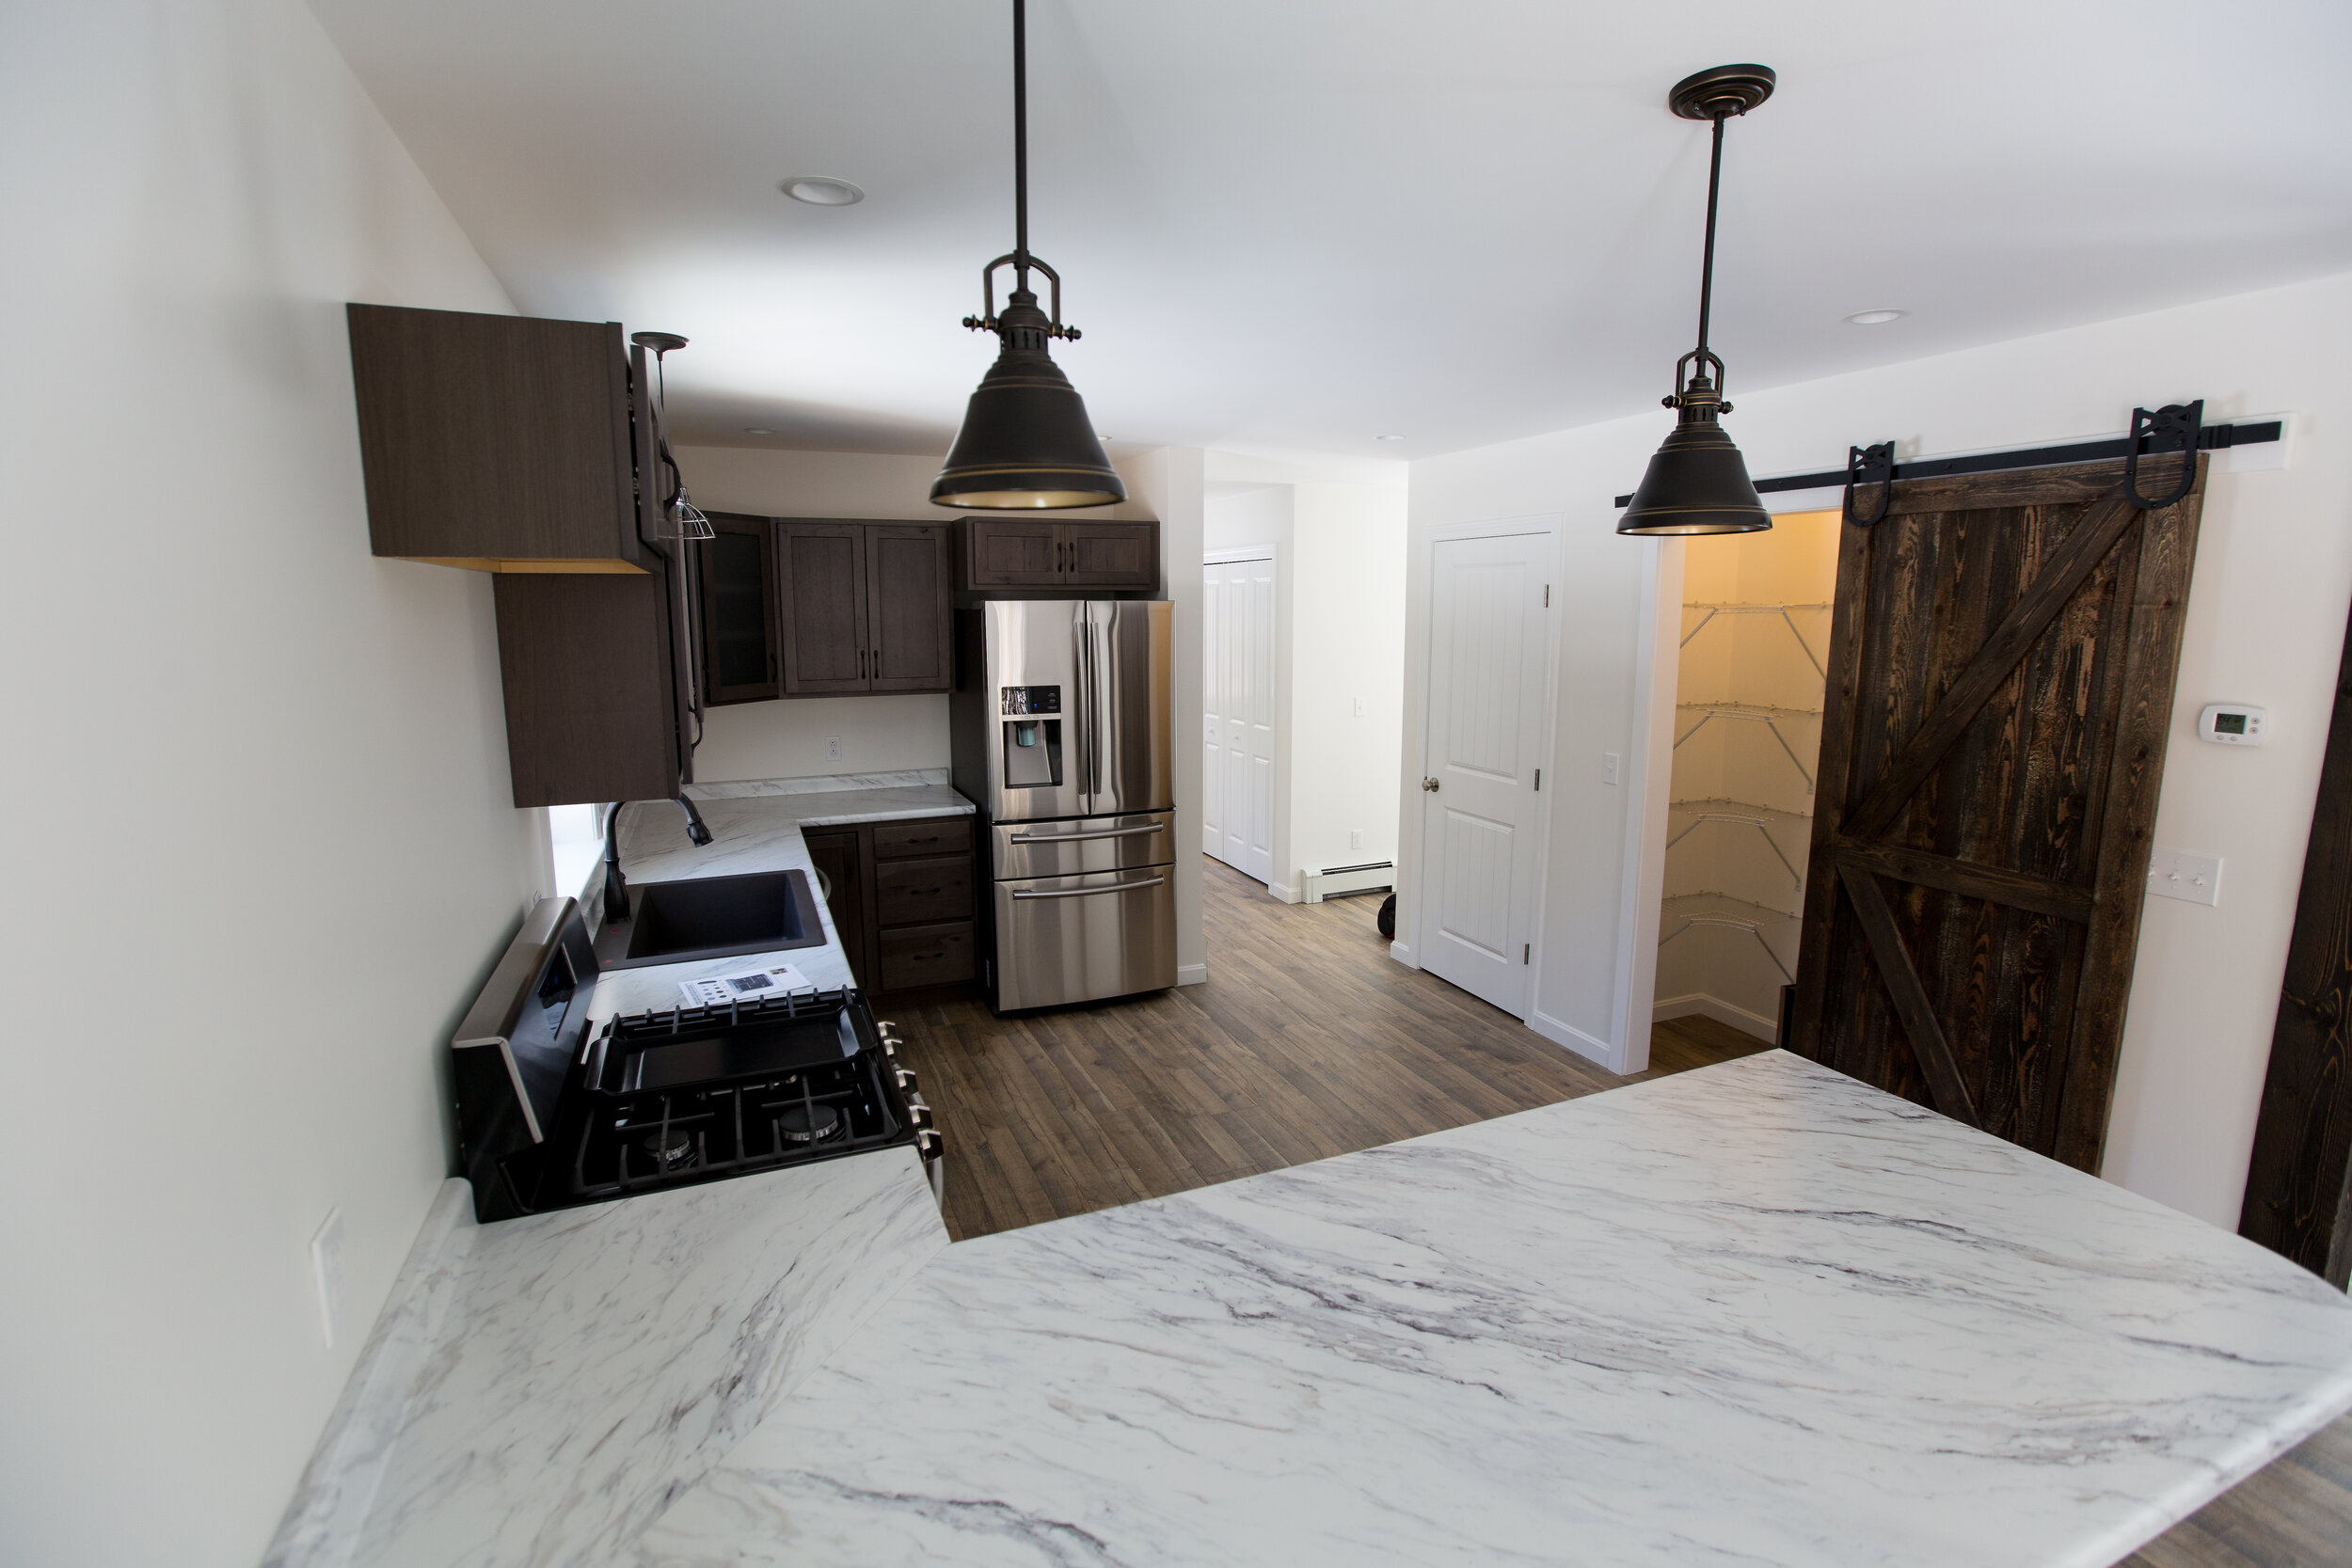 kitchenphoto (6).jpg